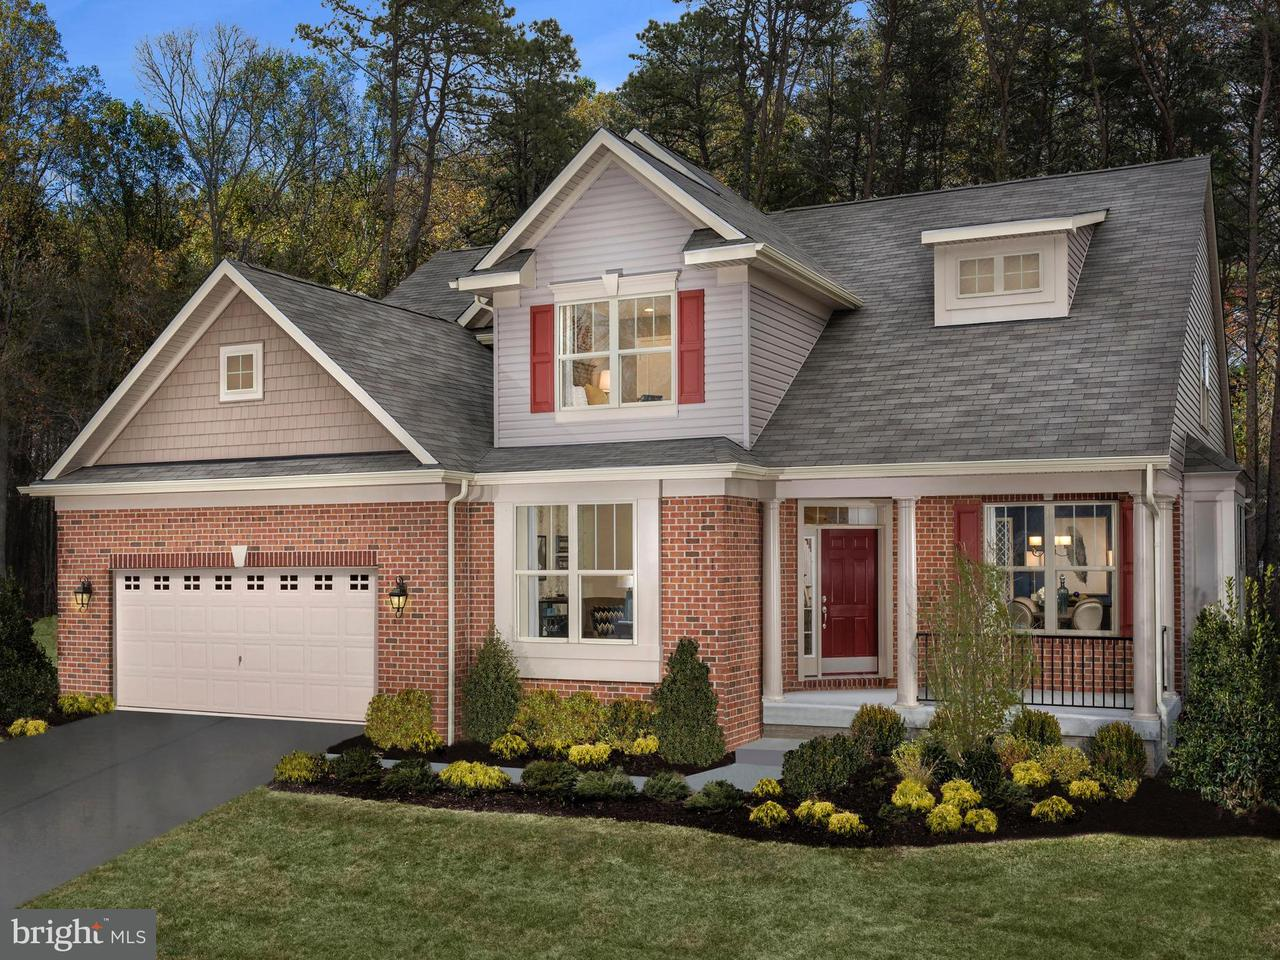 獨棟家庭住宅 為 出售 在 817 Janet Dale Lane 817 Janet Dale Lane Severn, 馬里蘭州 21144 美國